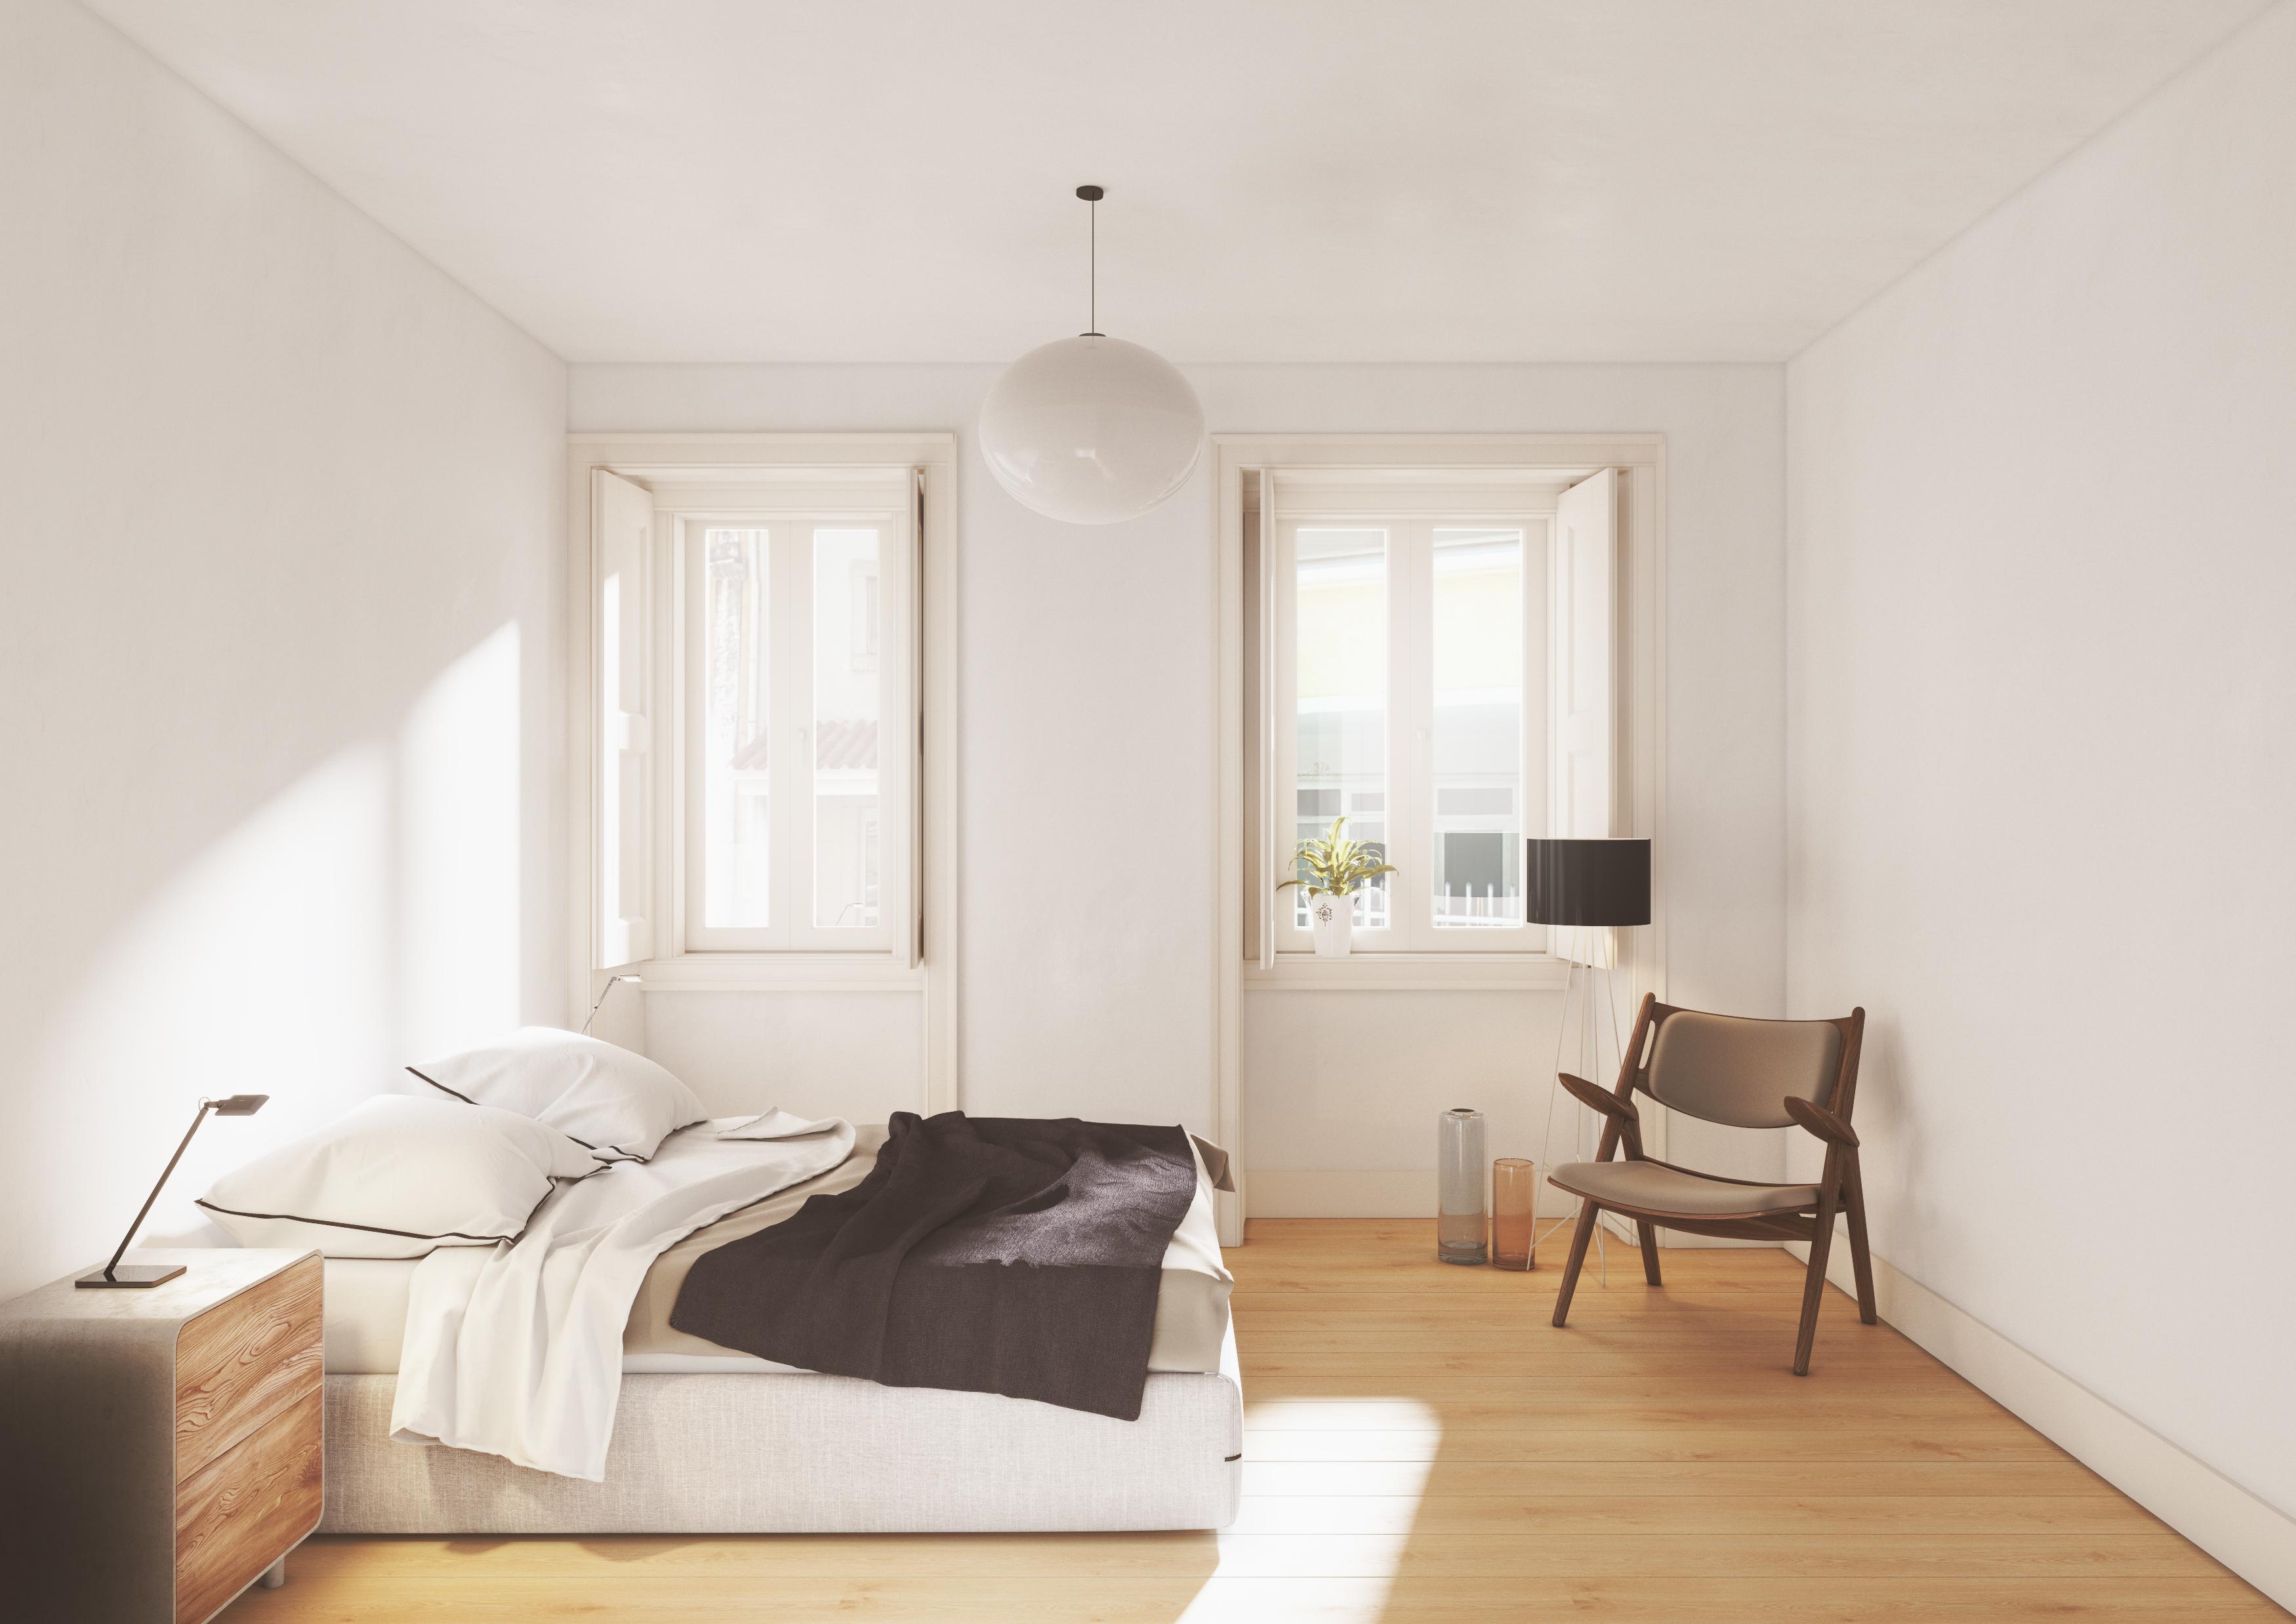 pf14498-apartamento-t2-lisboa-2